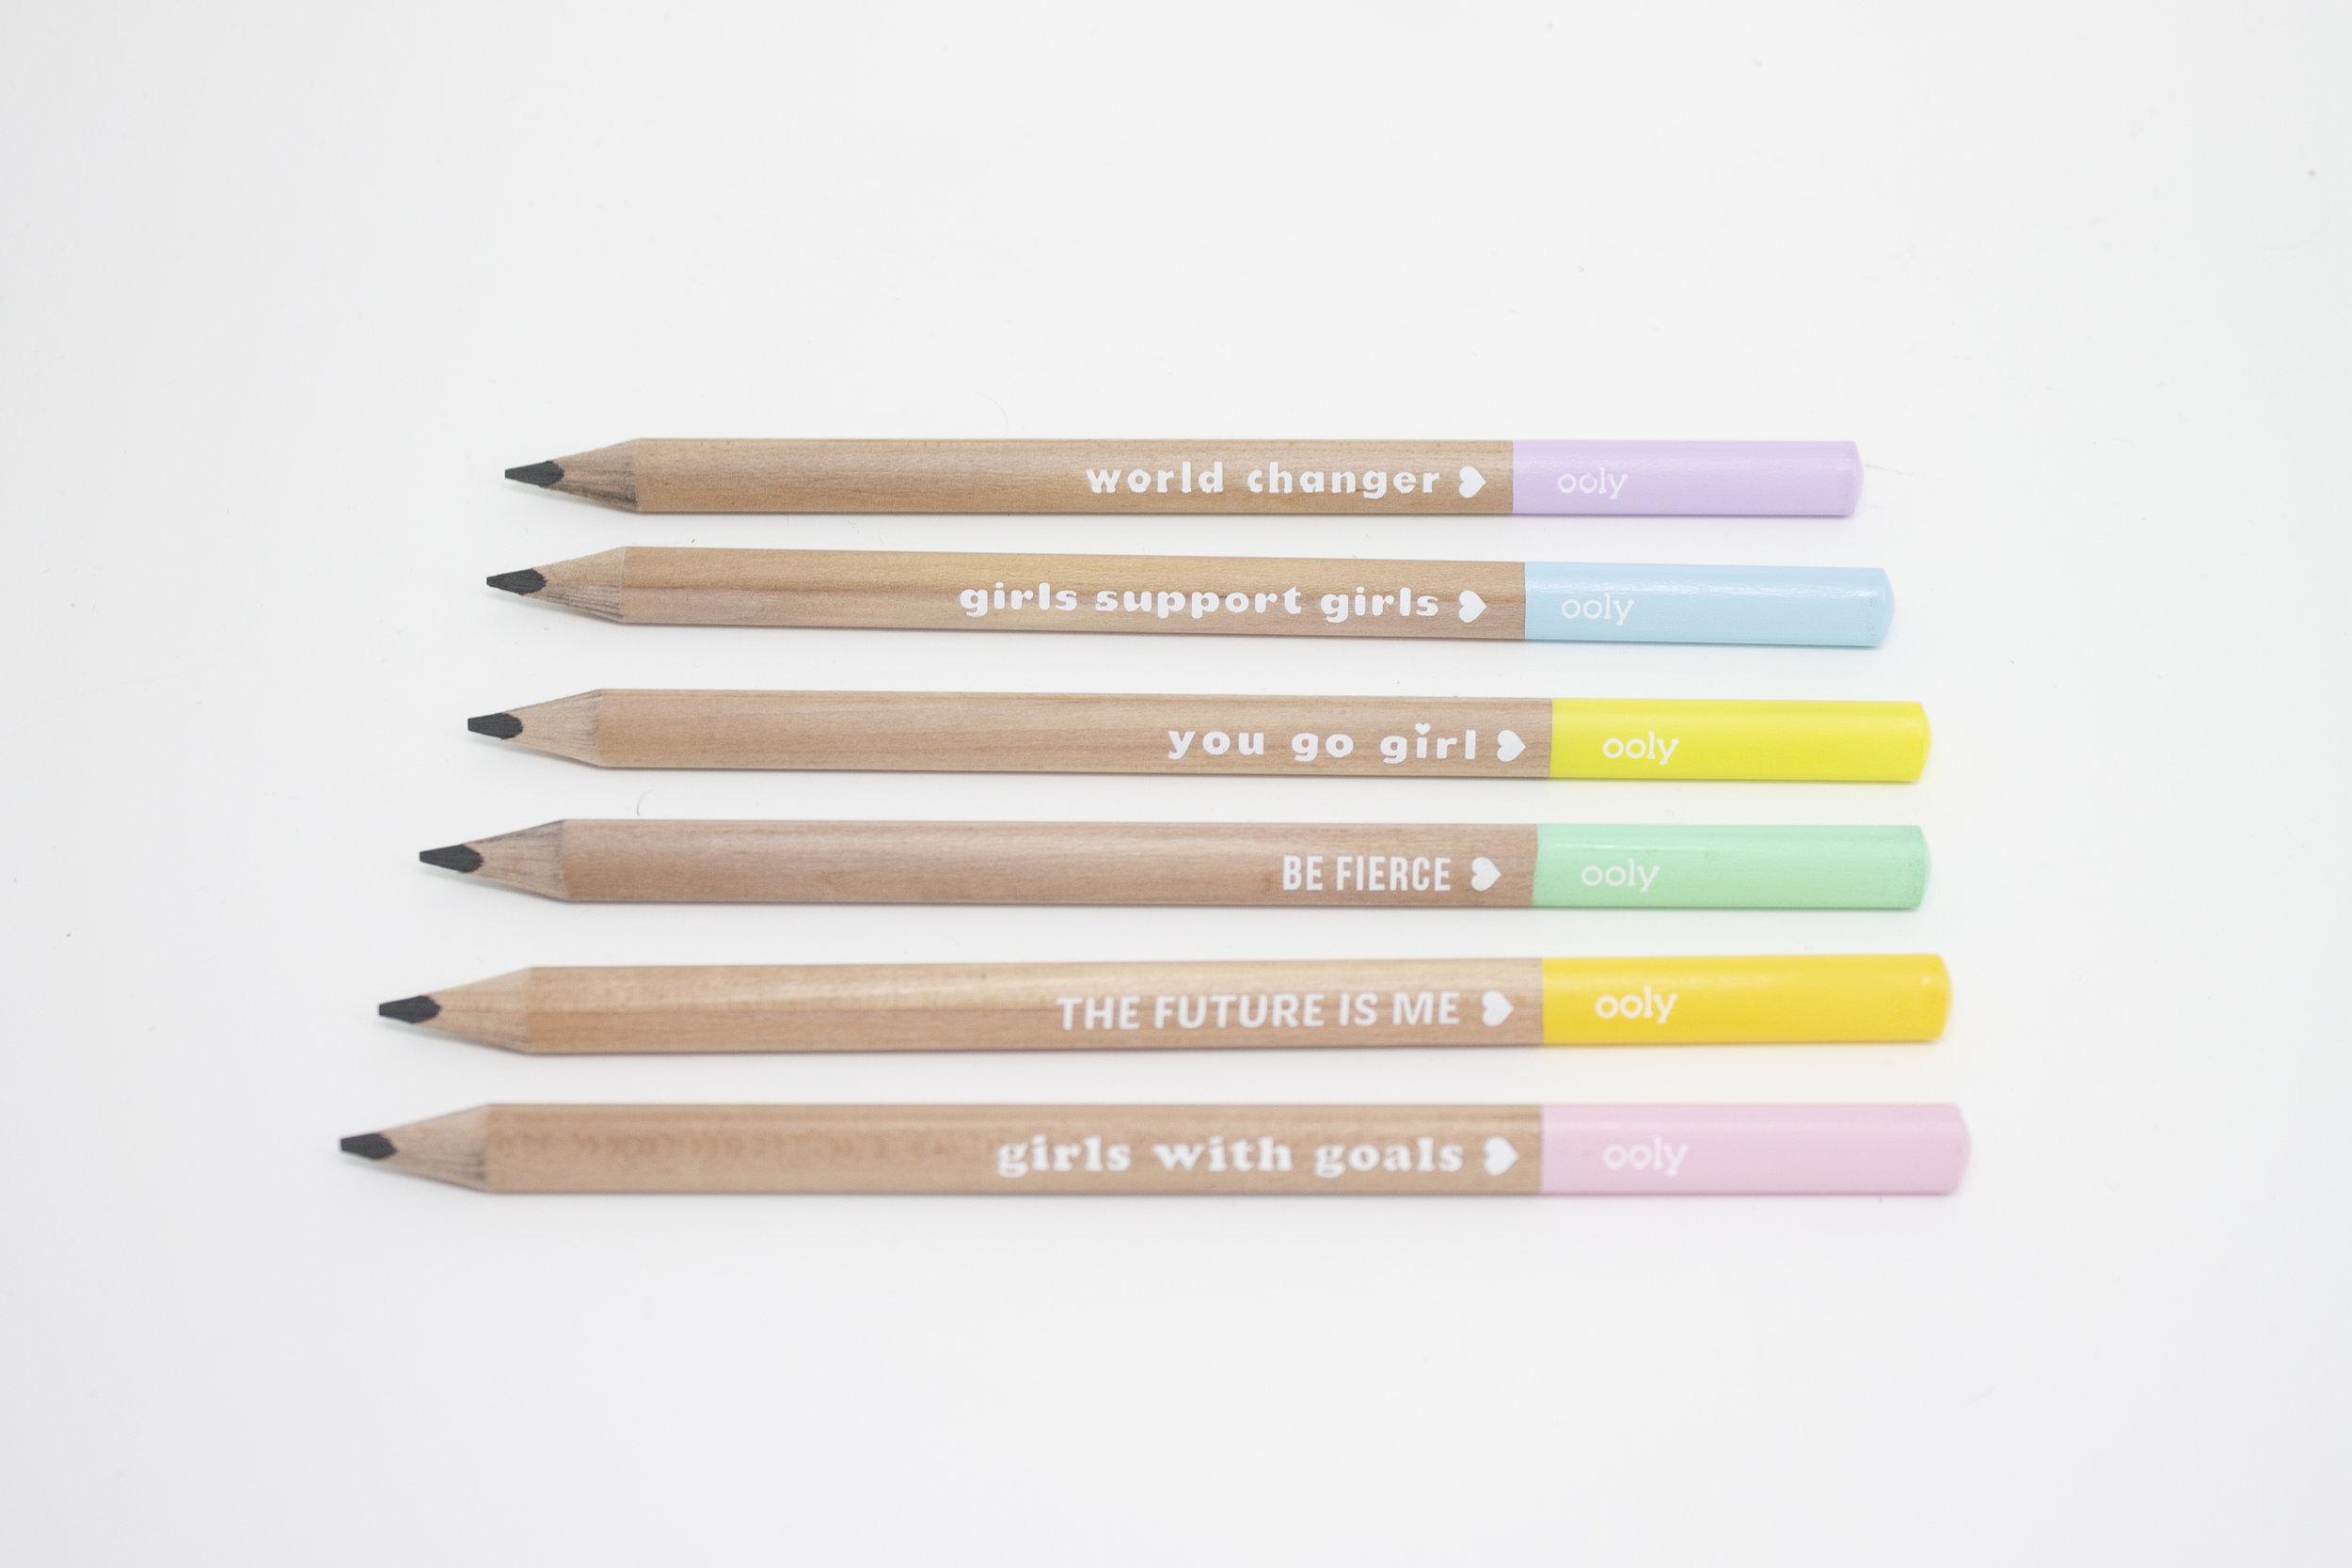 grl power pencils.jpg